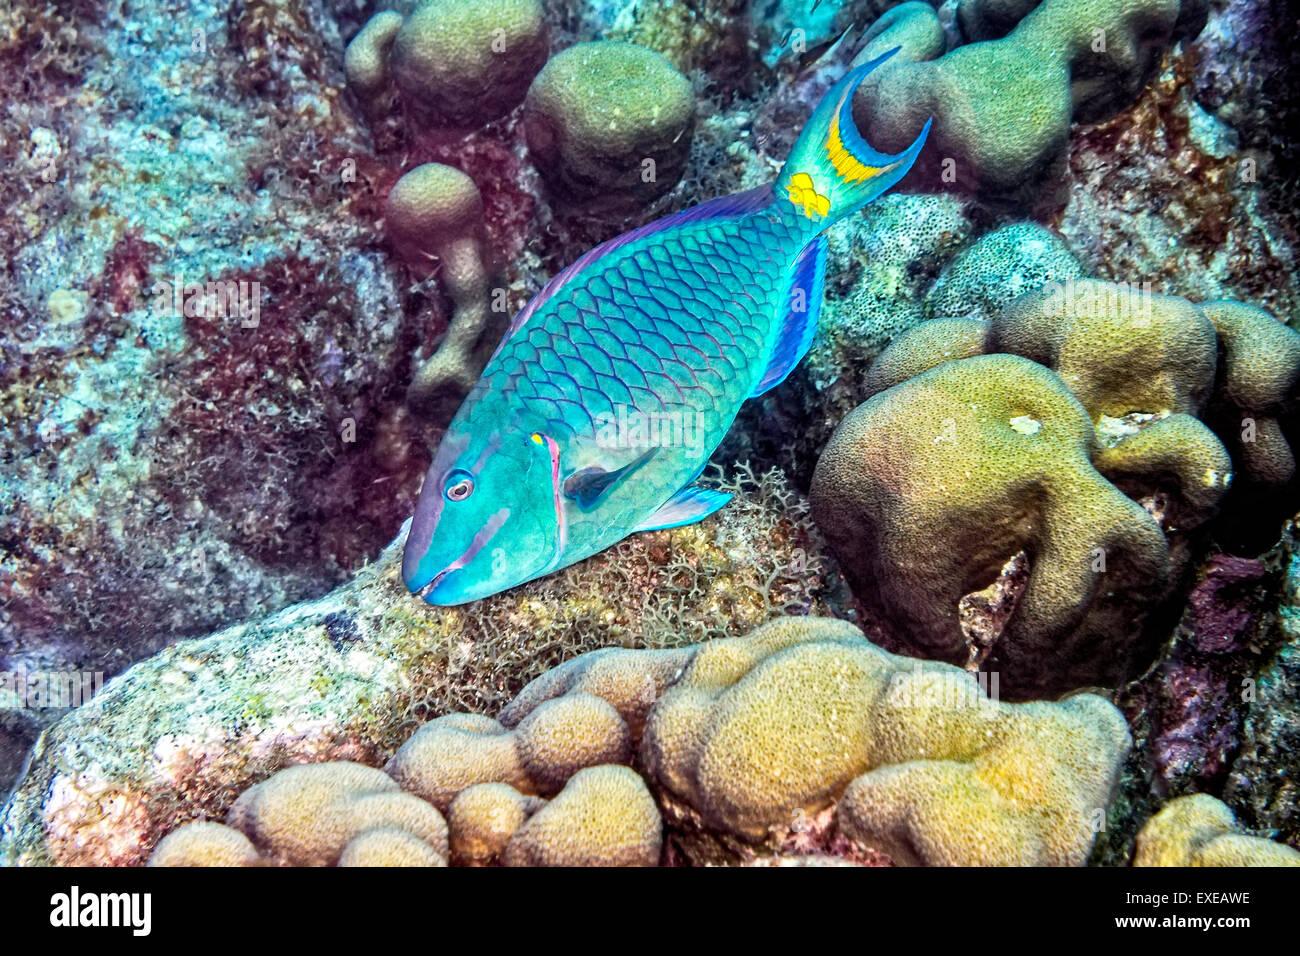 Stoplight ParrotfishCleaning Corals at Sharon's Serenity in Klein Bonaire, Bonaire - Stock Image